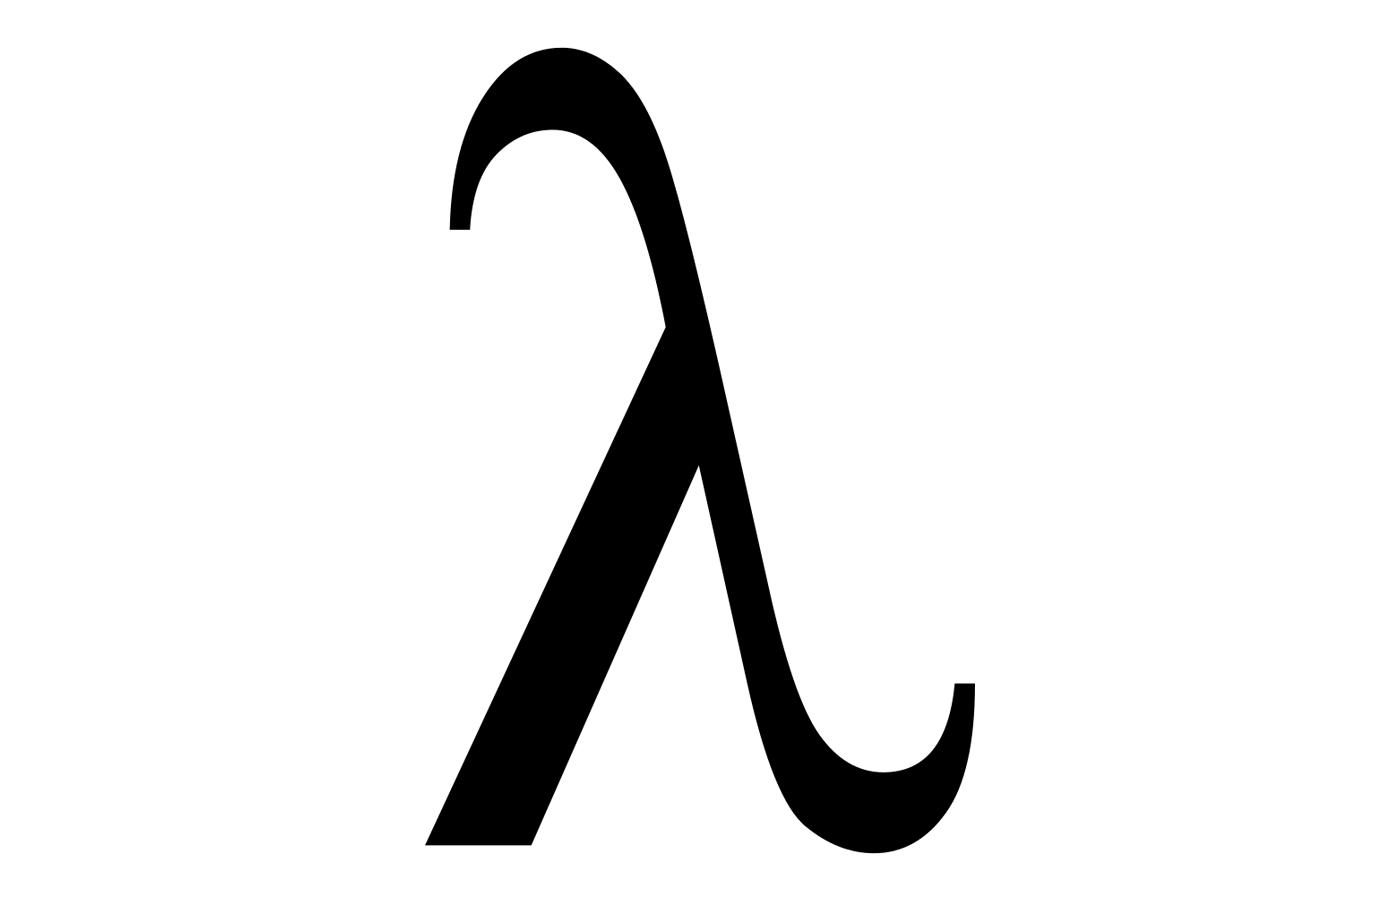 Greek lowercase letter Lambda